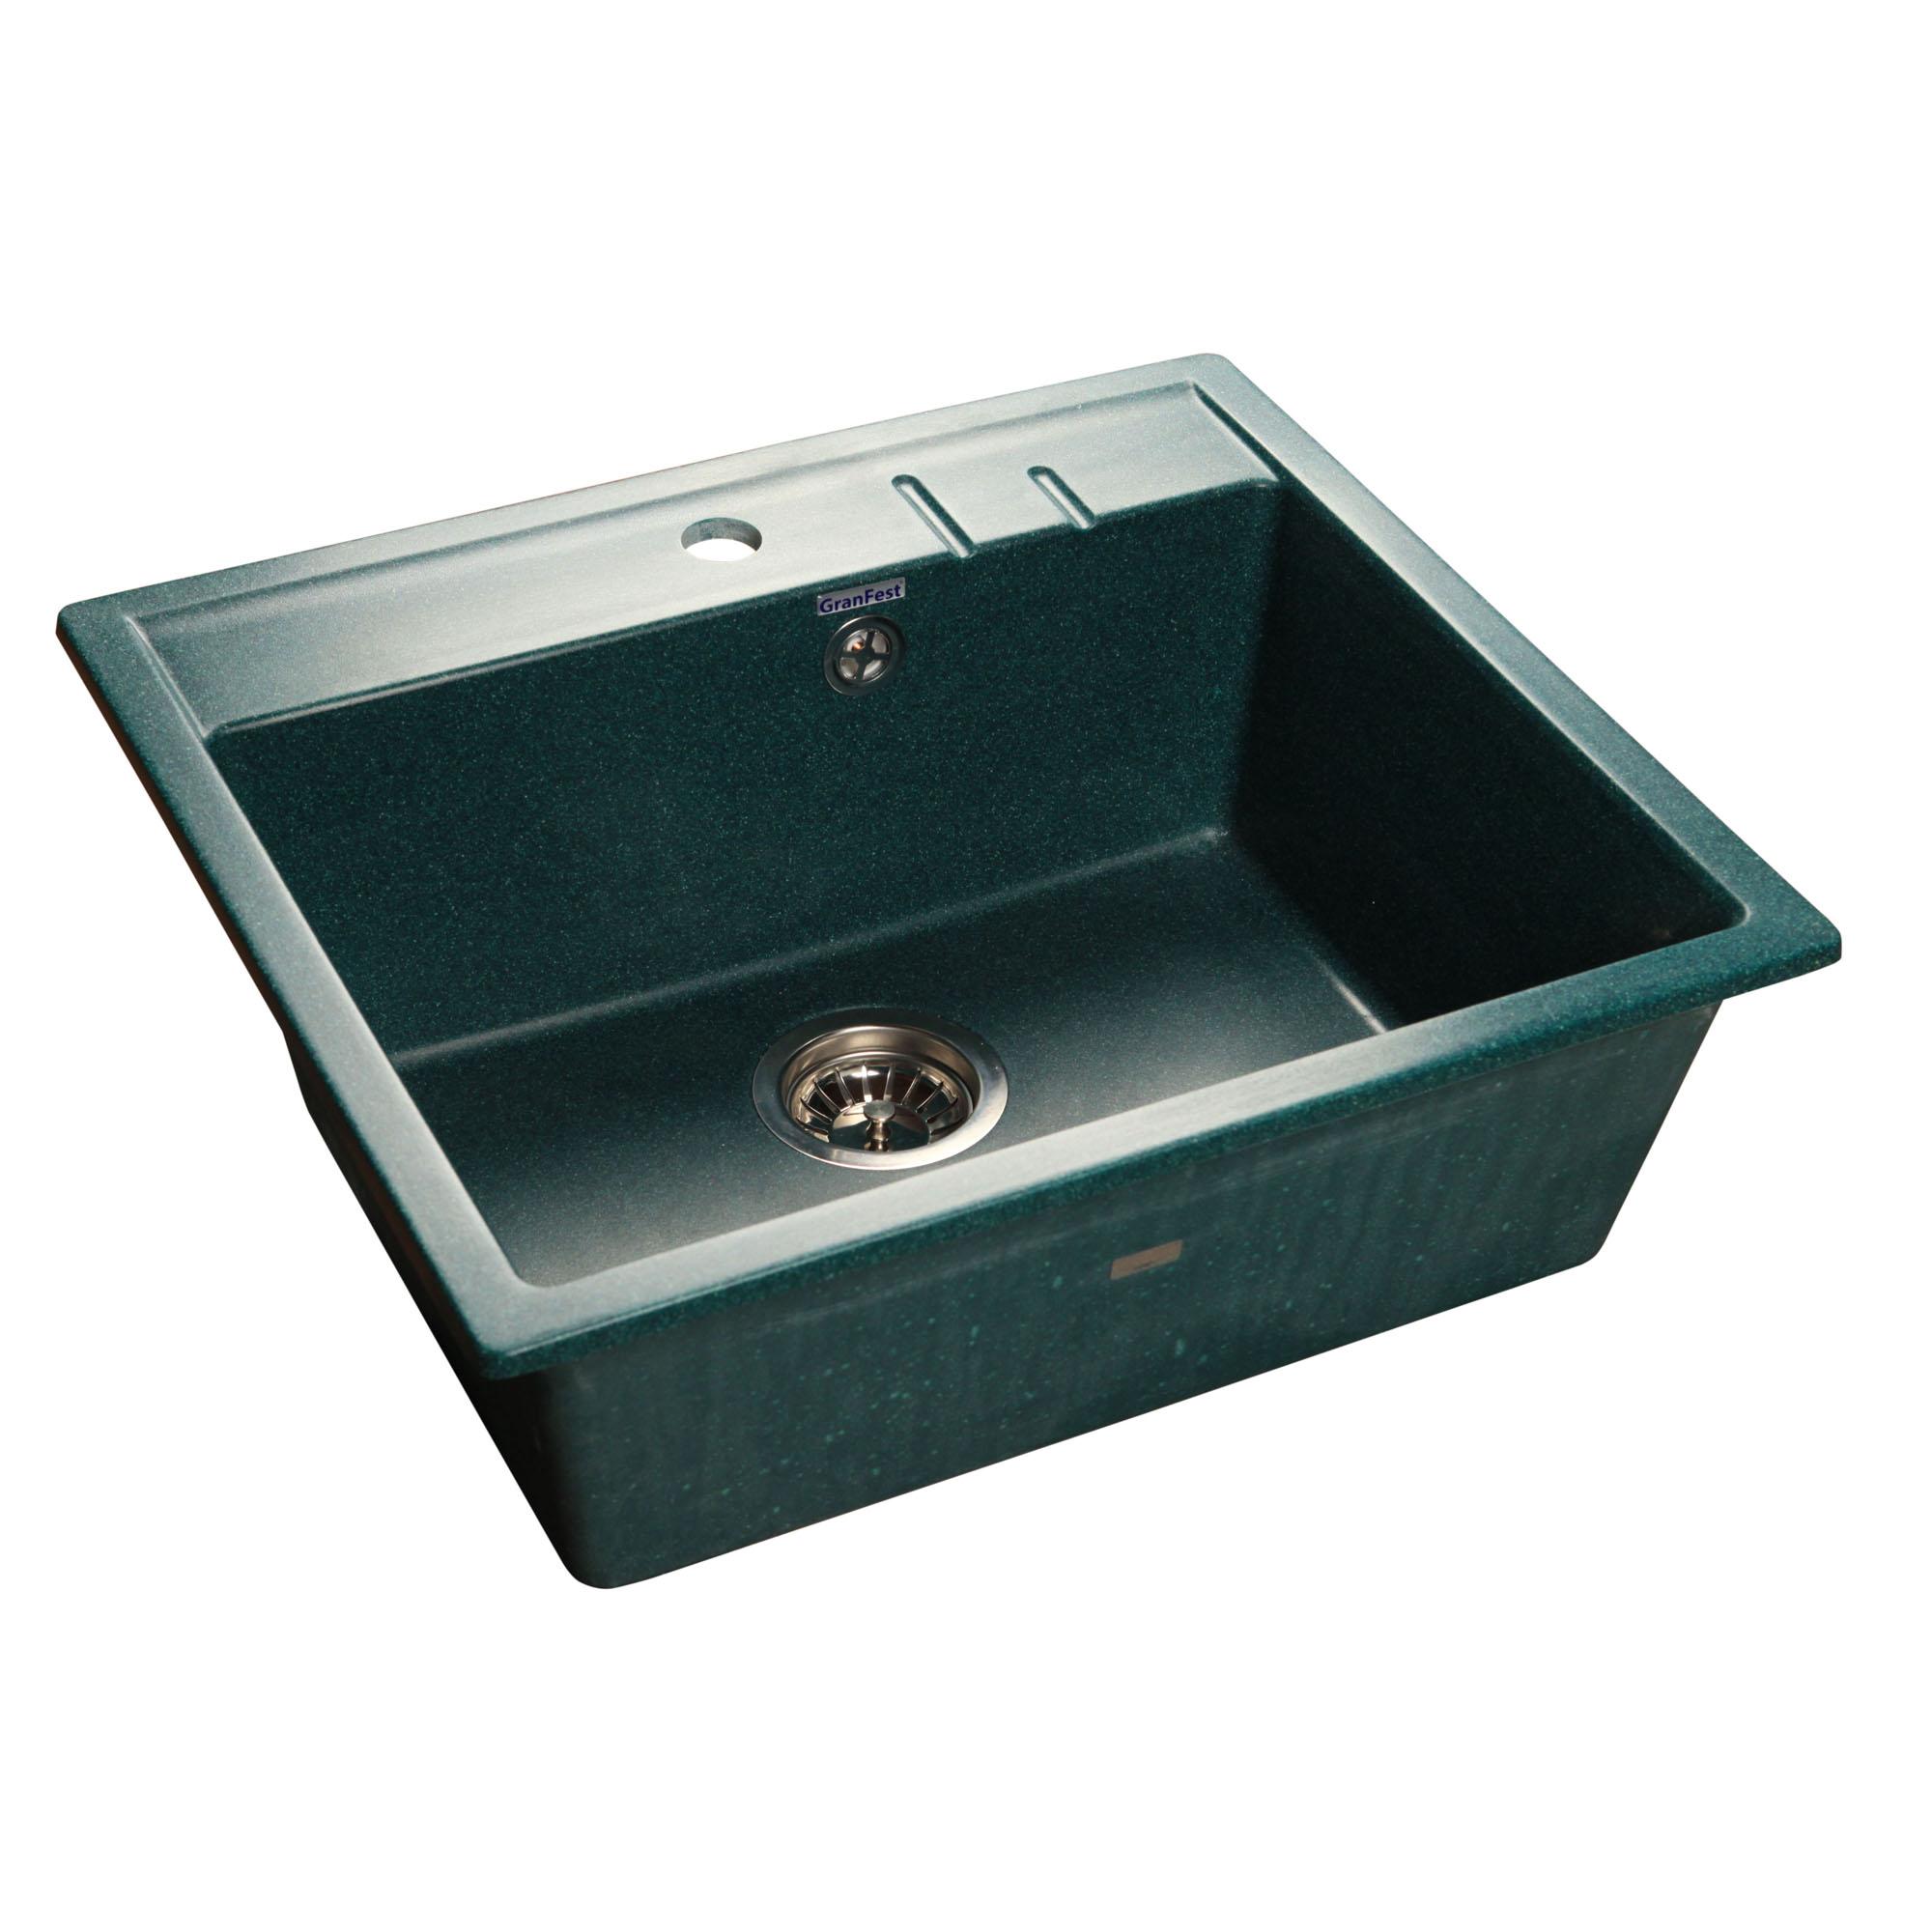 Кухонная мойка GranFest Quadro GF-Q560 зеленый мойка кухонная granfest гранит 565x510 gf q560 песок